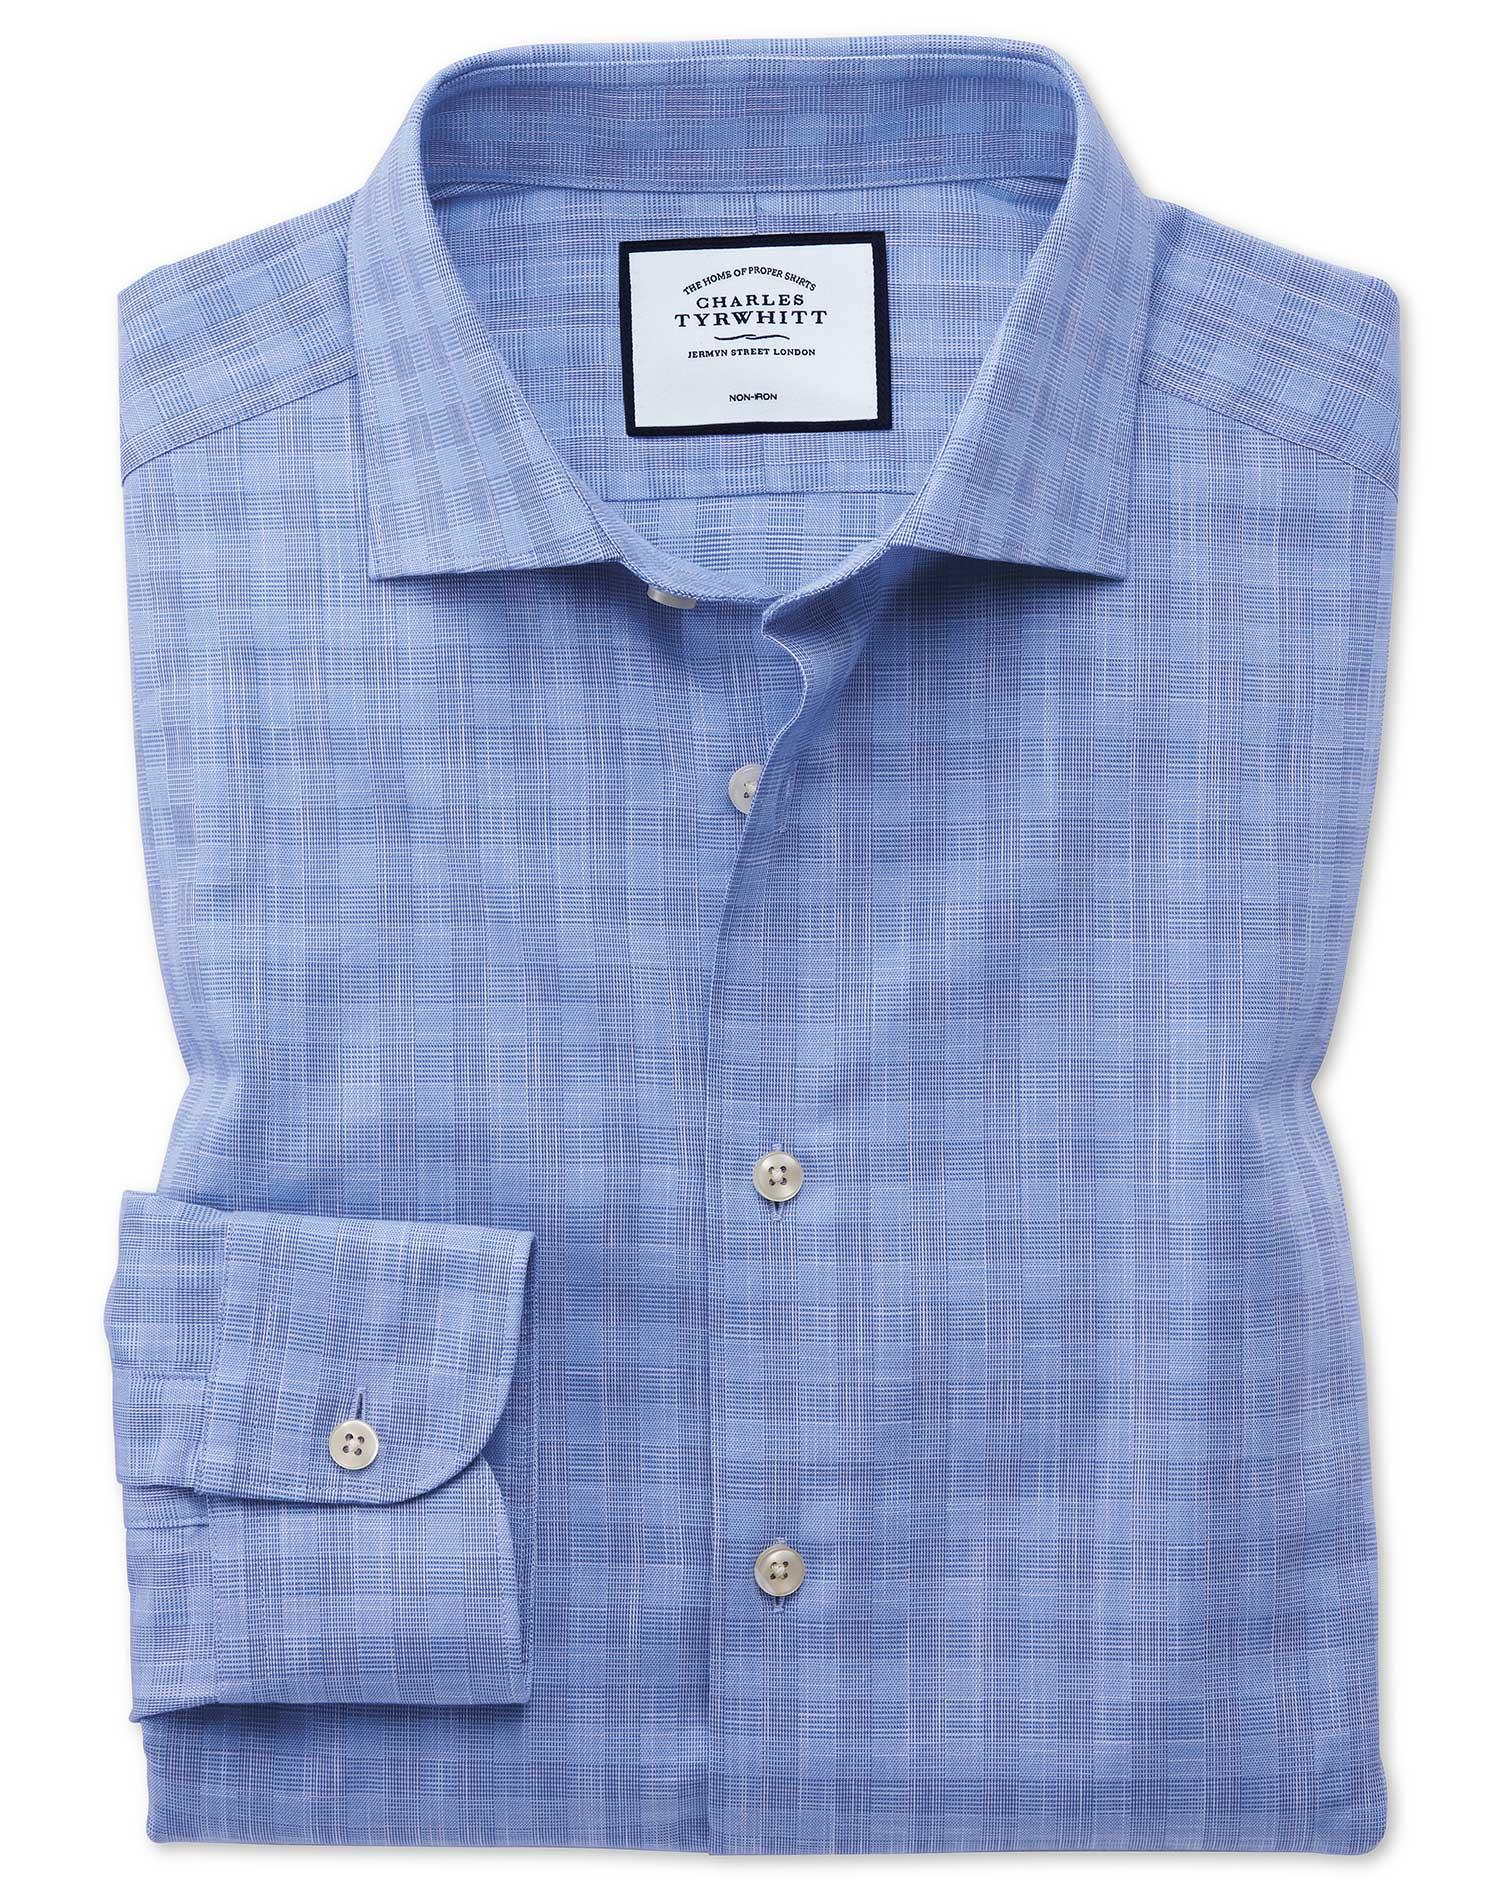 Extra Slim Fit Business Casual Egyptian Cotton Slub Sky Blue Check Formal Shirt Single Cuff Size 16/